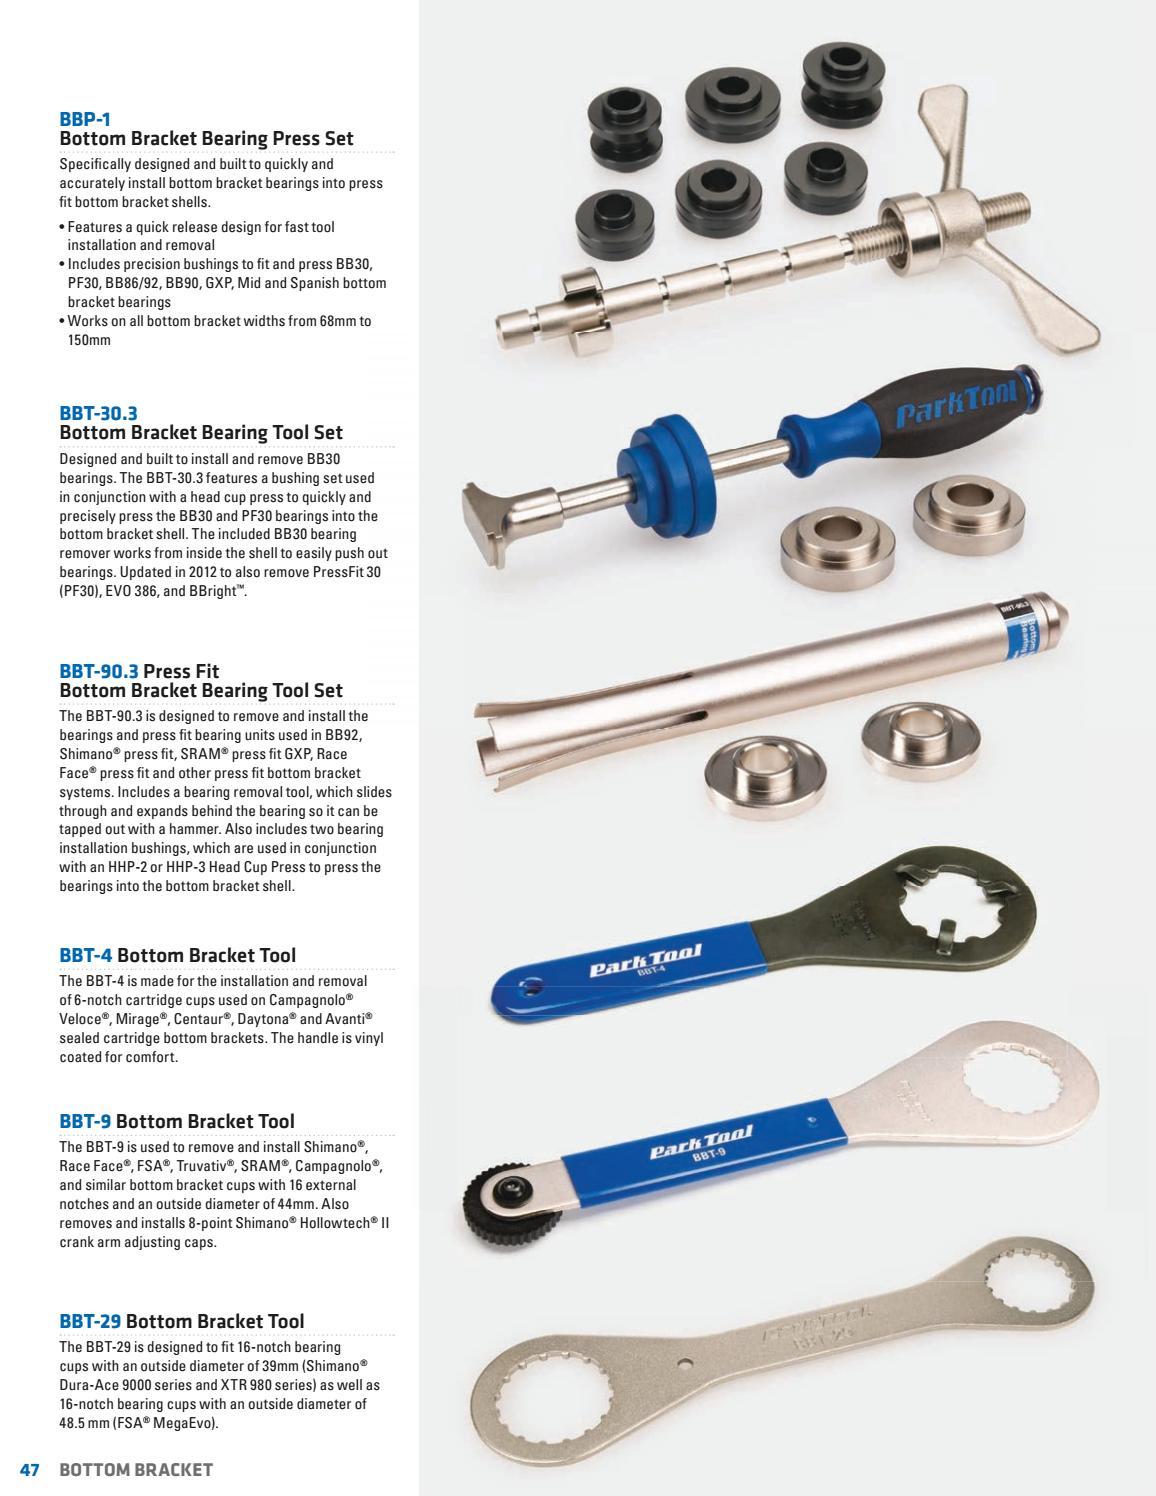 PARK TOOL BBT9 HollowTech II bottom bracket and crank arm tool